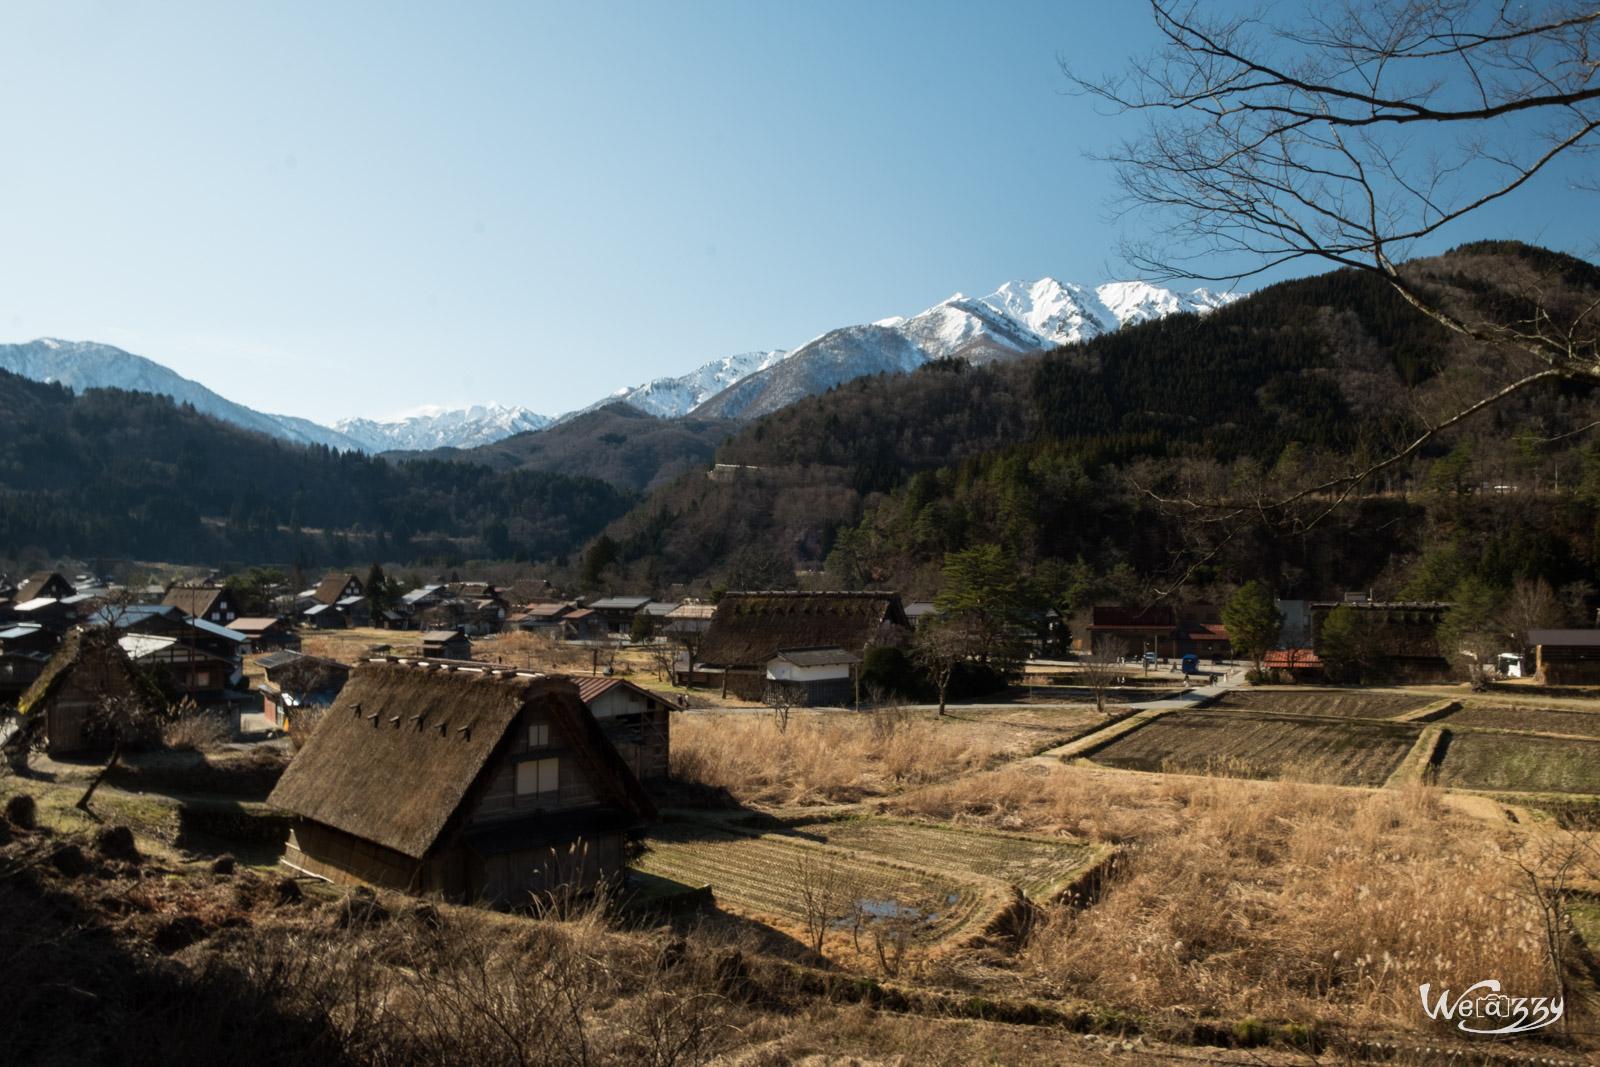 Japon, Shirakawa, Voyage, campagne